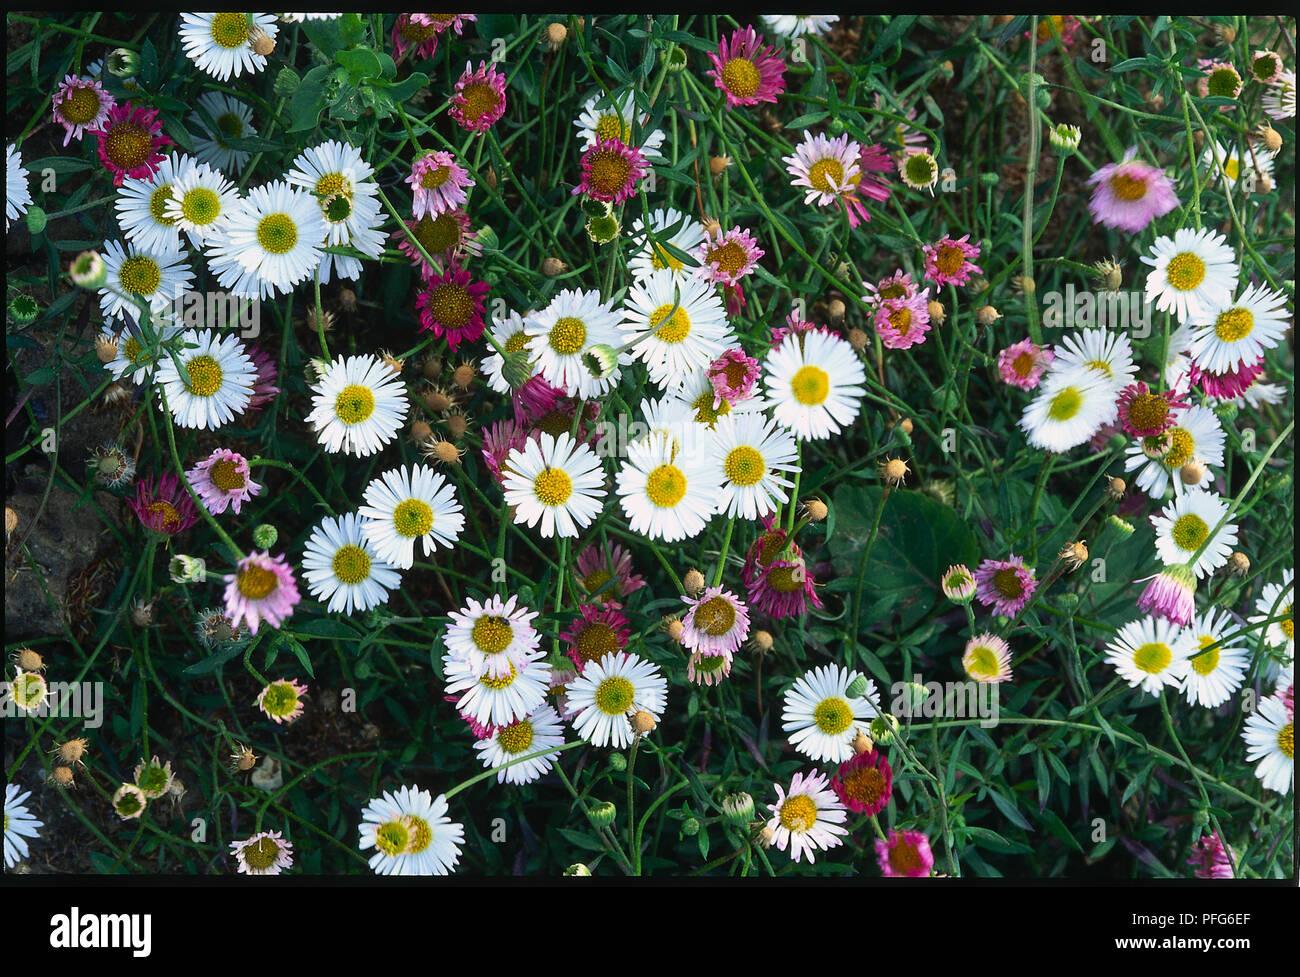 Erigeron Karvinskianus White Flowers Growing In Grass View From